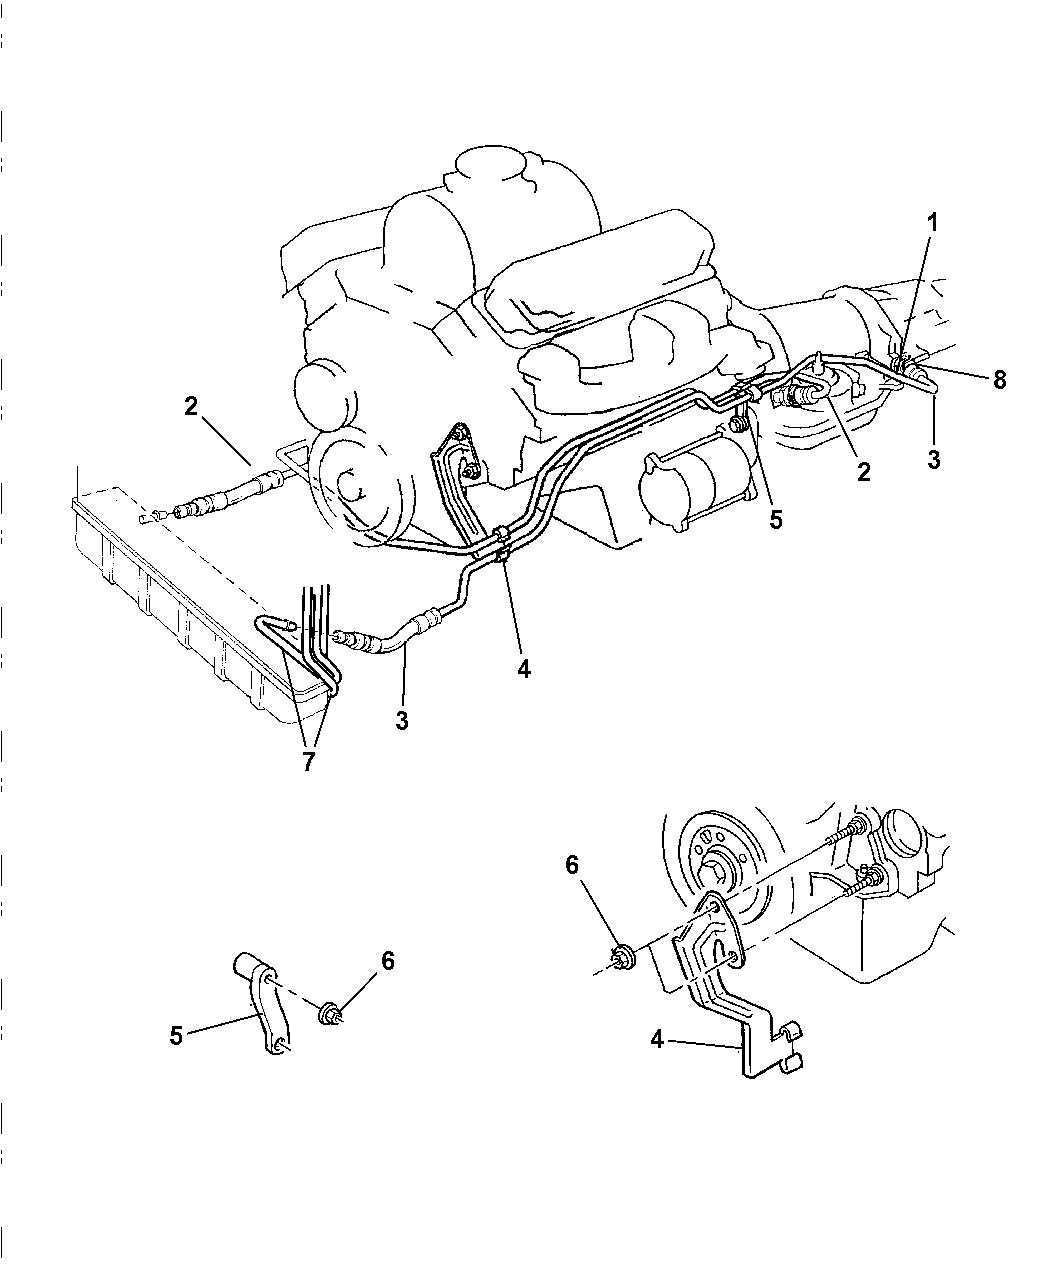 2001 dodge dakota transmission schematic